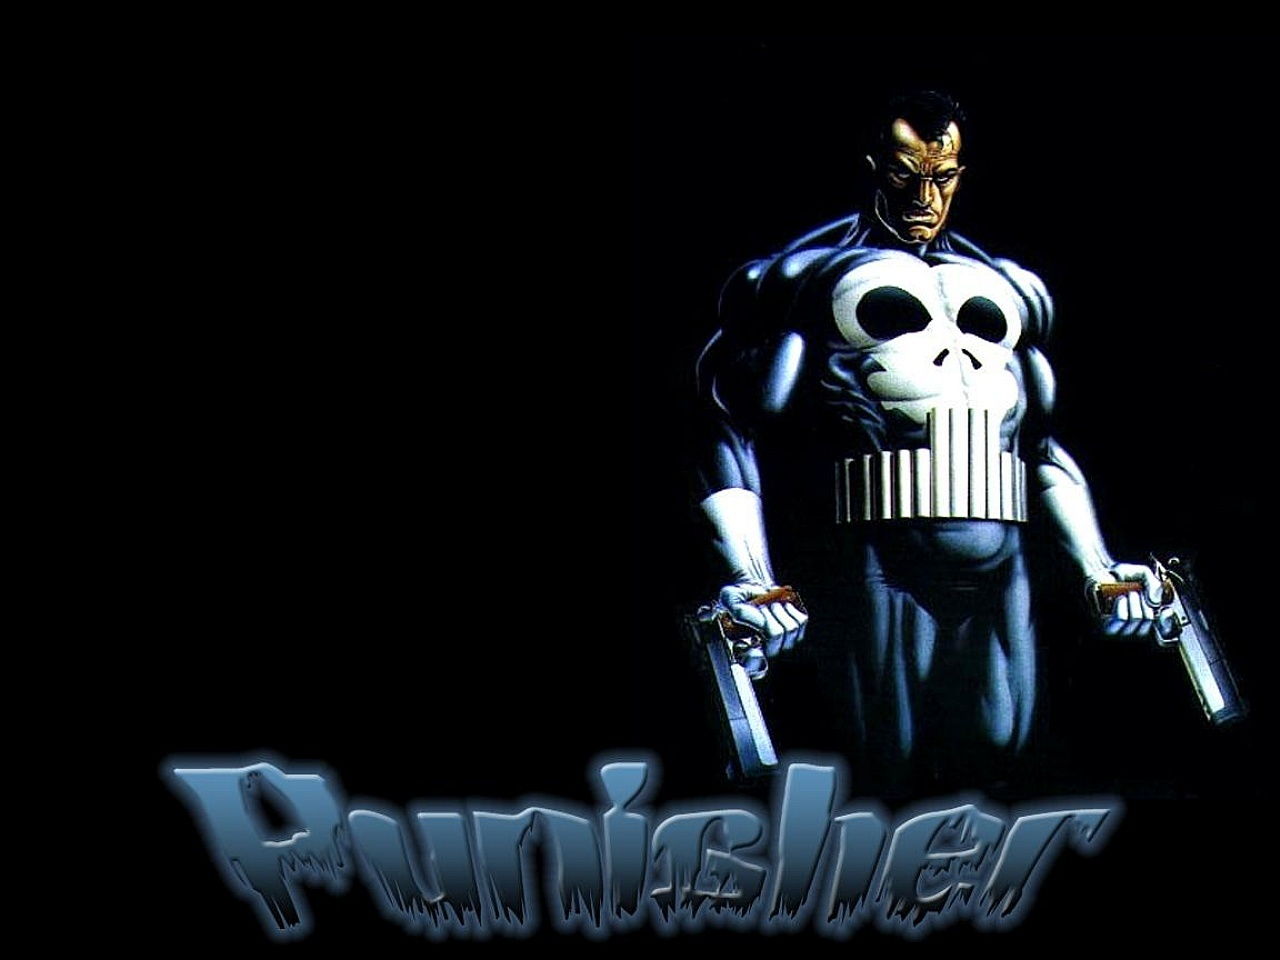 punisherakartsky   The Punisher Wallpaper 6967487 1280x960